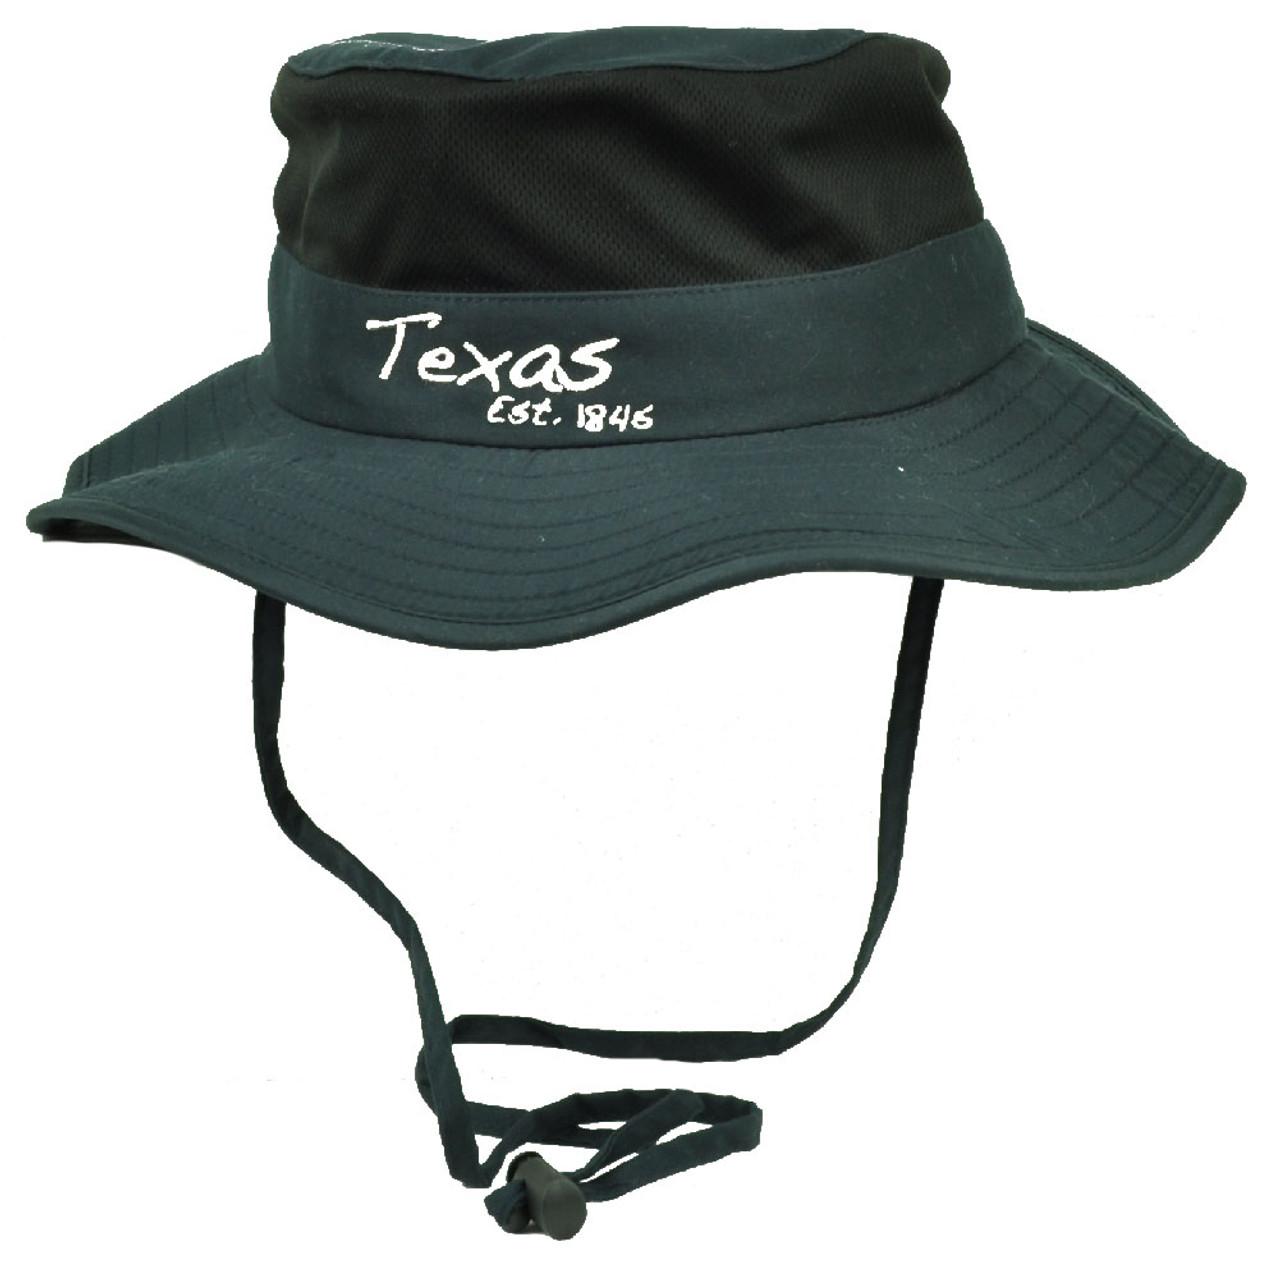 6c18011d7d2fae Texas State Navy Blue Booney Sun bucket Hat Chin Strap Mesh Band Outdoors  USA - Cap Store Online.com